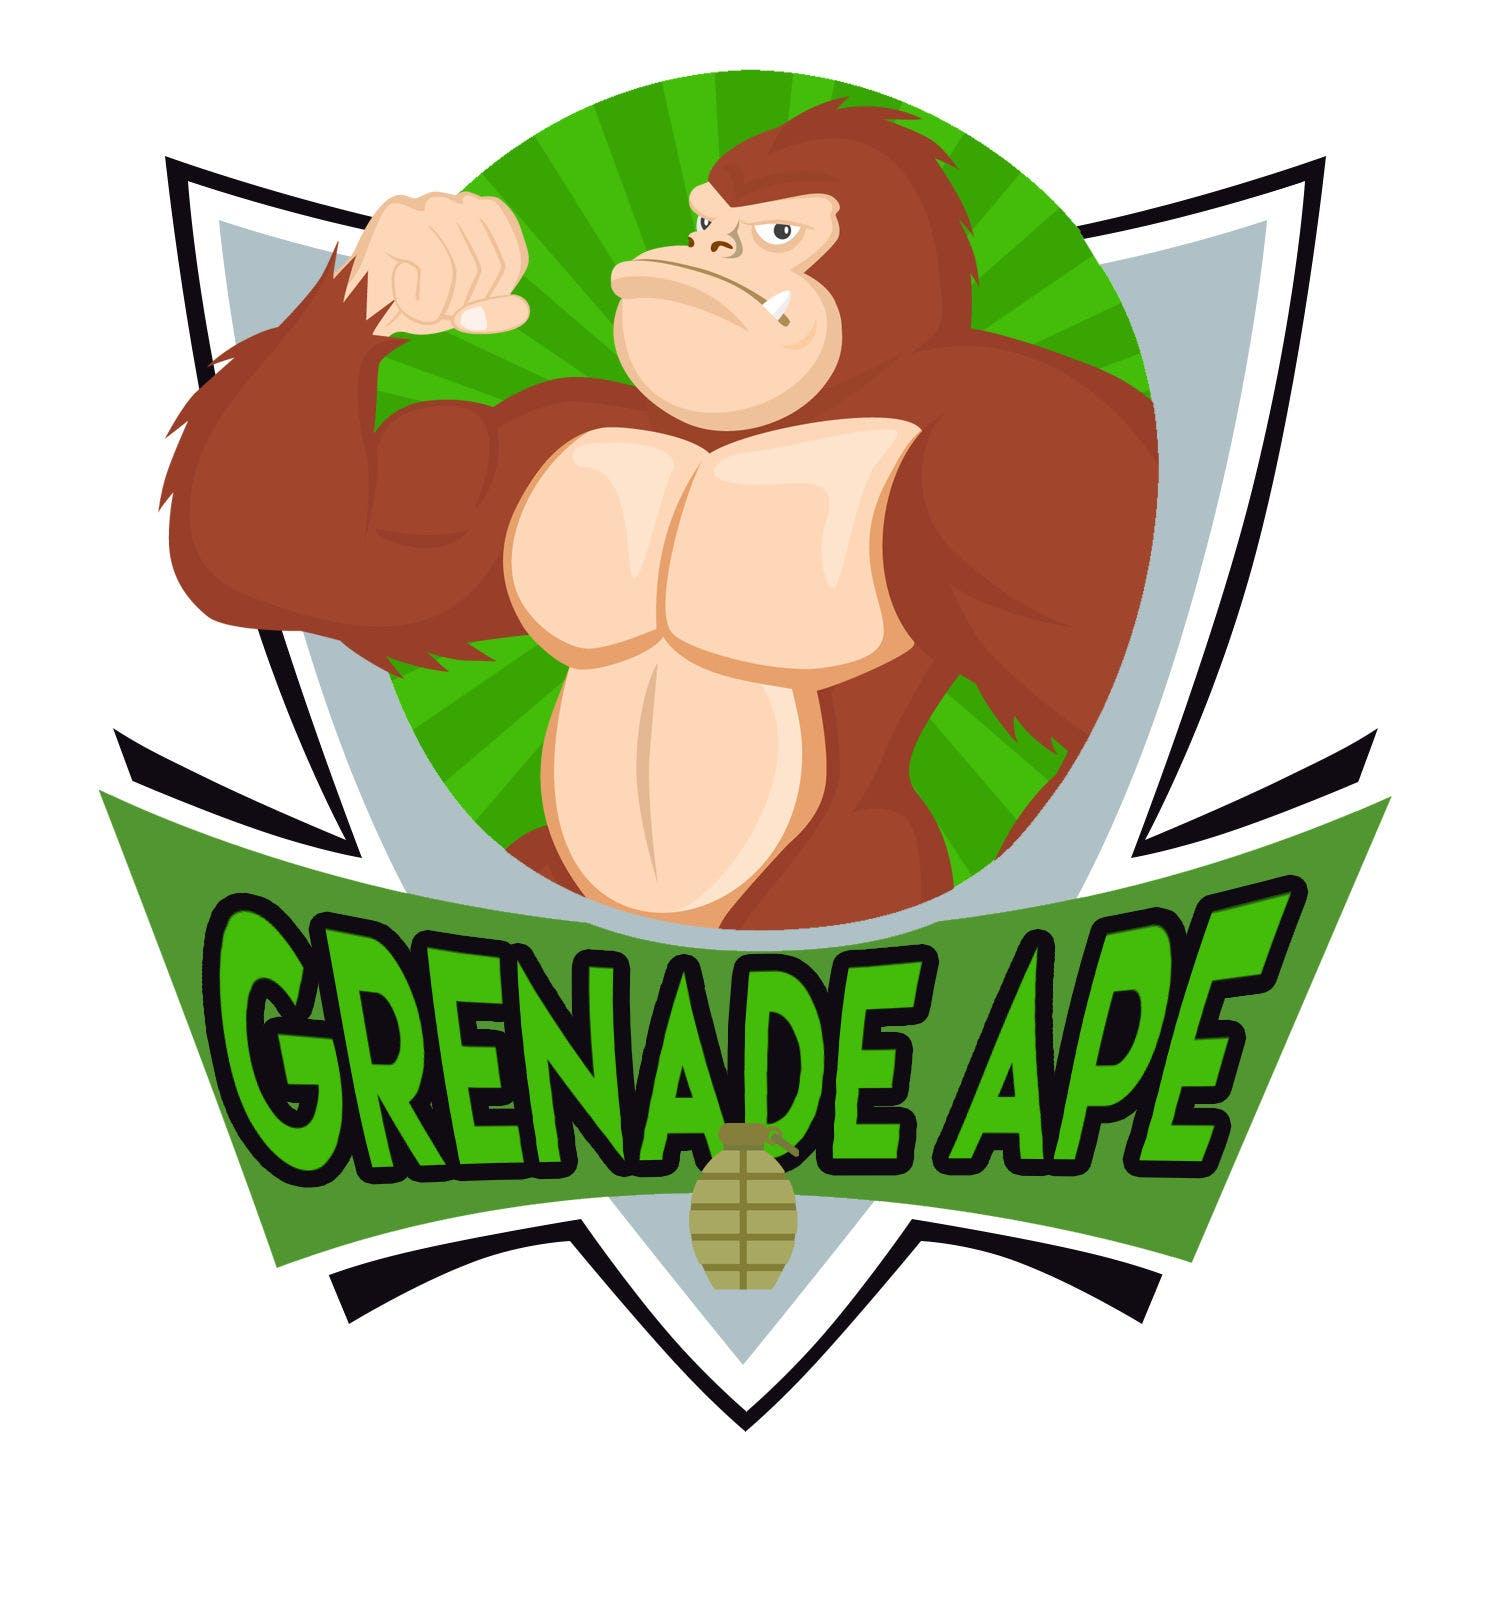 Logo2 n1i3xxmgqb